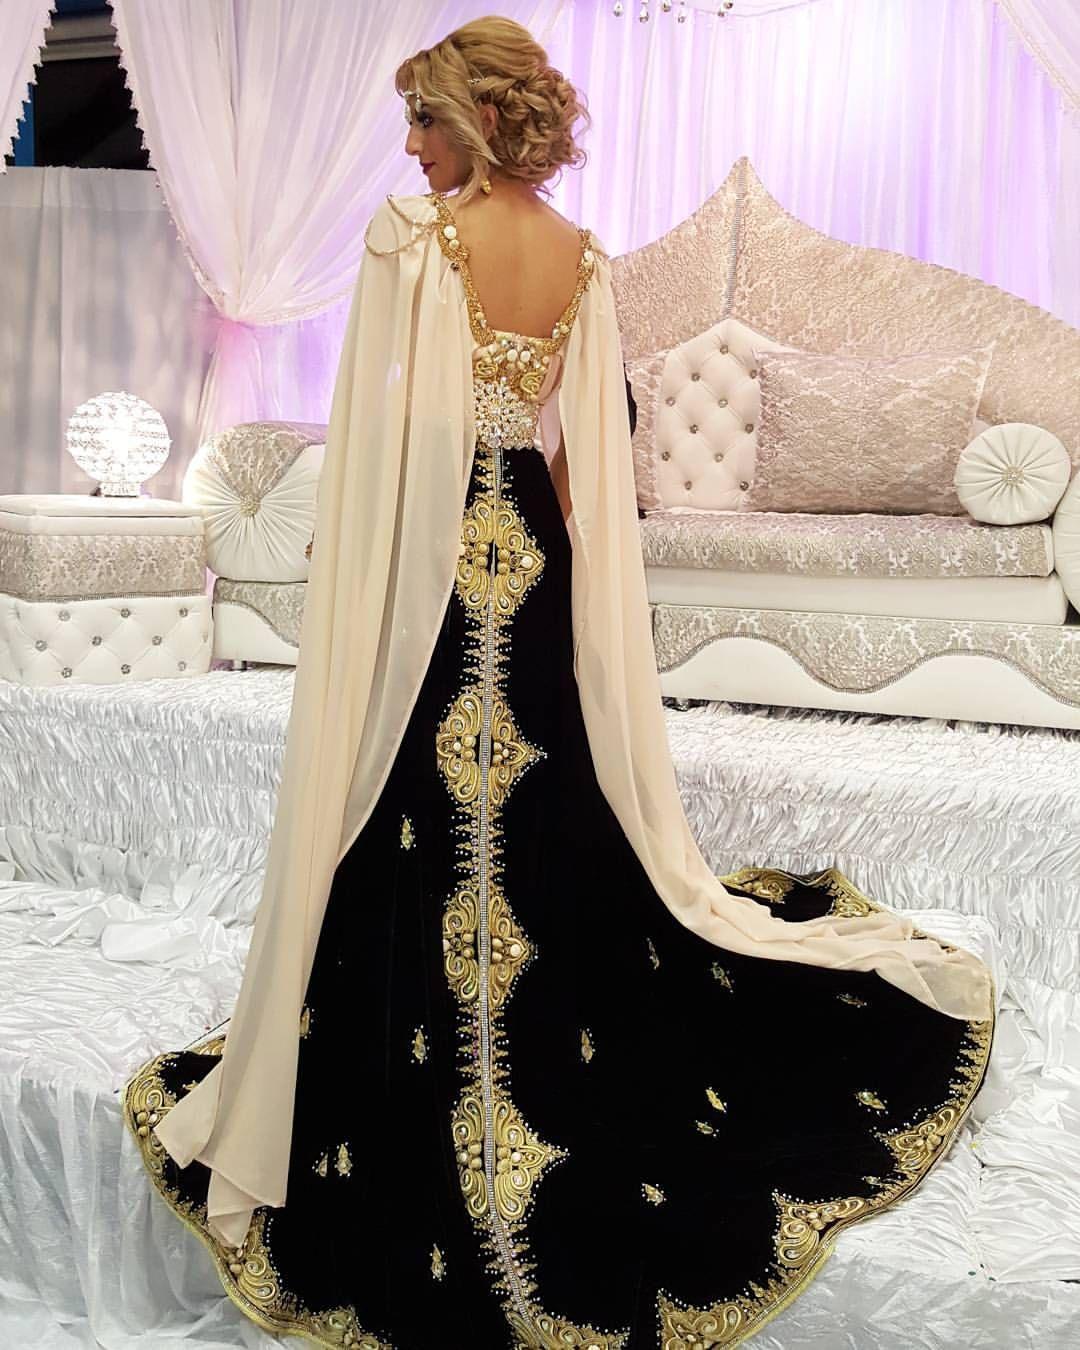 d50ce1da8fd Prestation ziana . Bonne soirée mes beautés !! Big kiss ❤❤  ziana   ziananora  negafa  bridalmakeup bridalstyling  bride  bridalstyling  dress   wedding ...